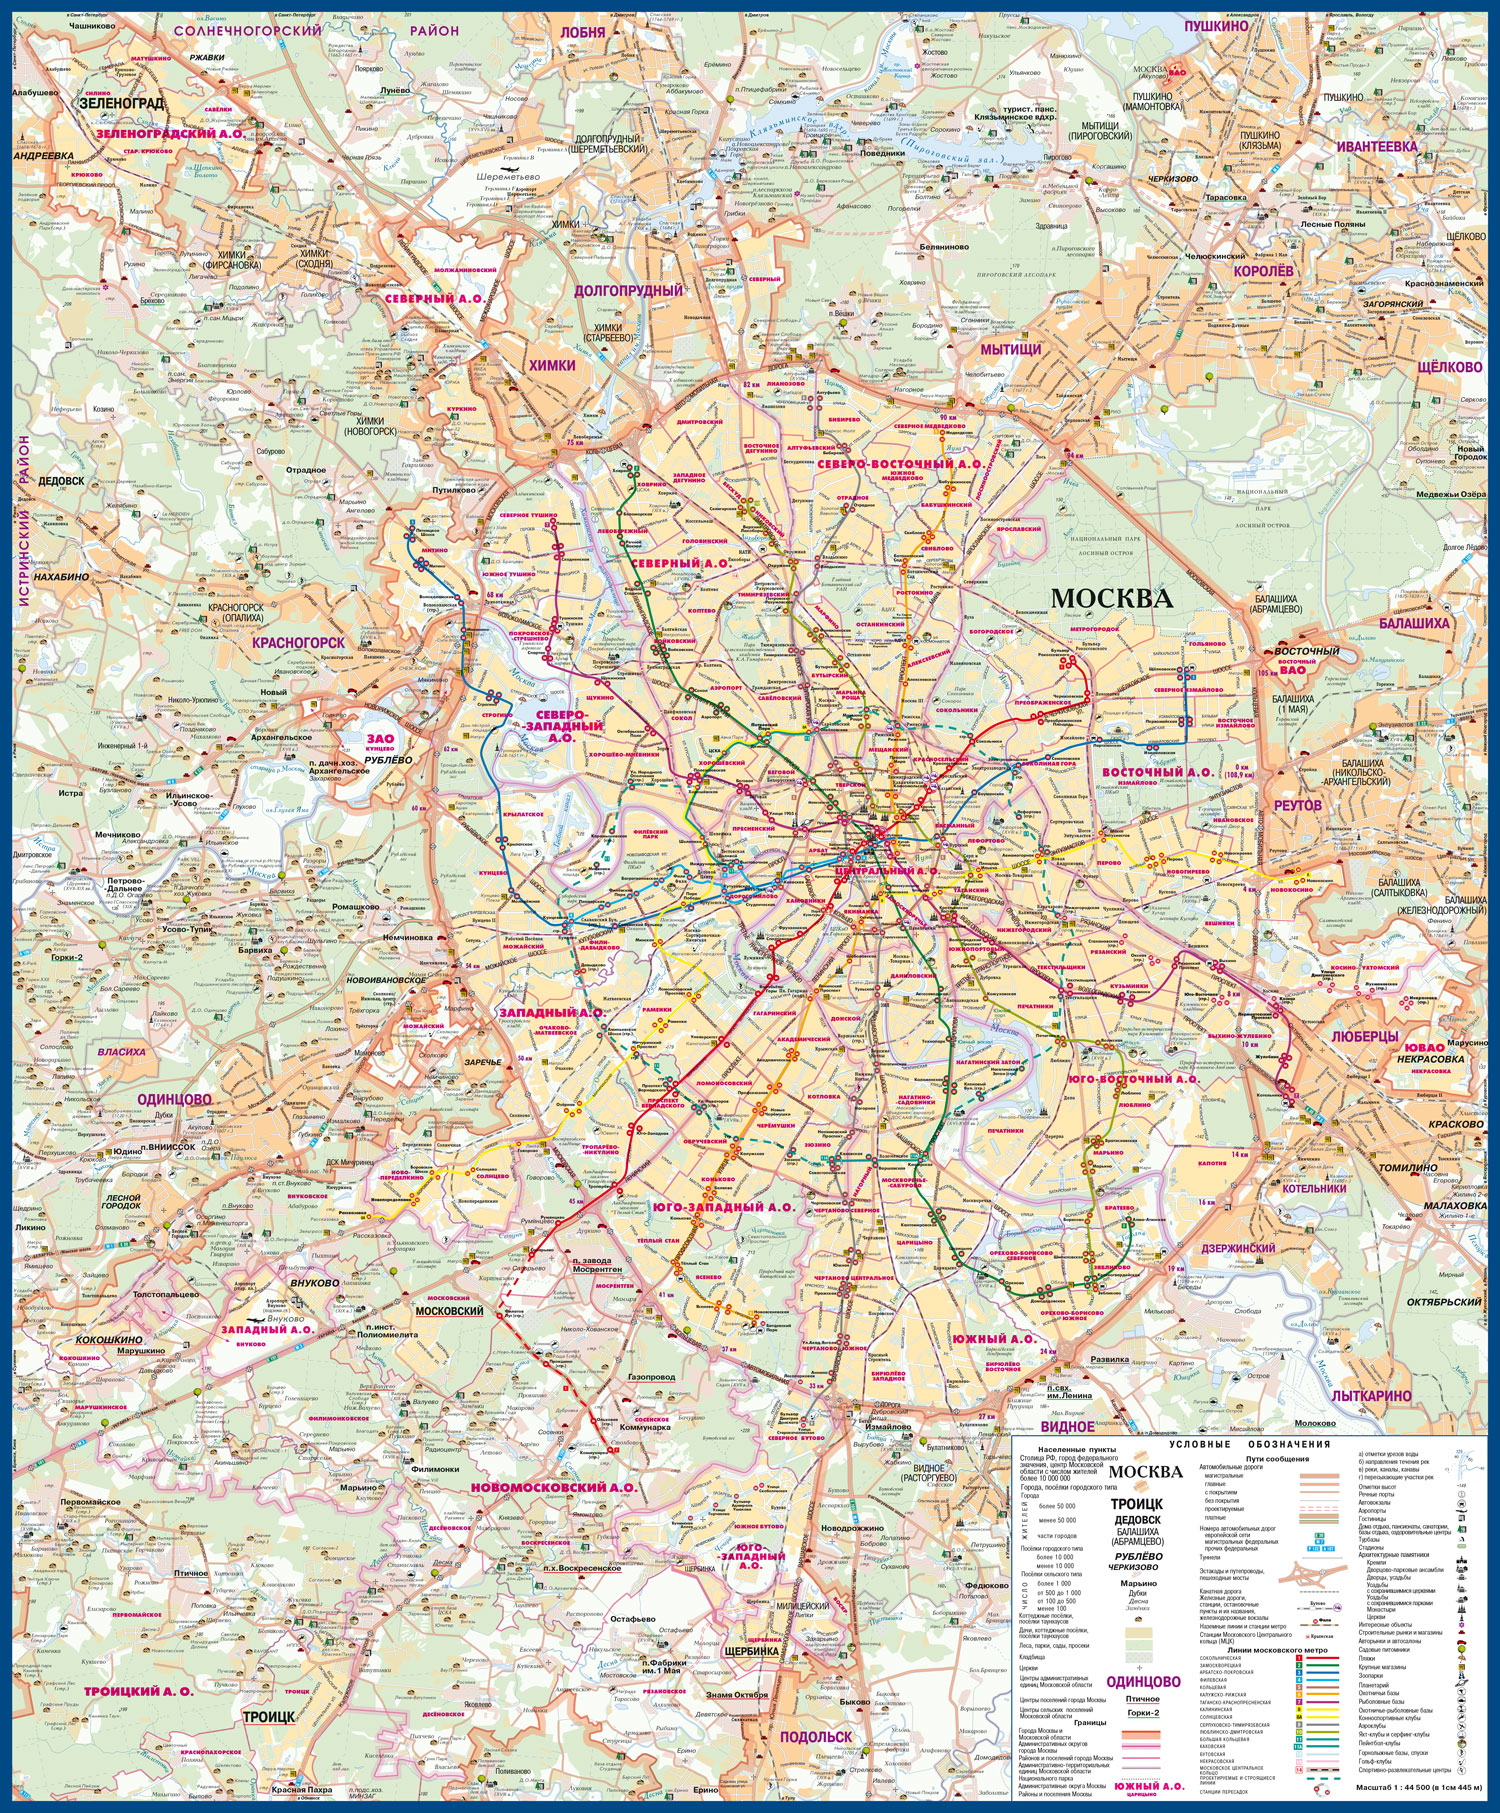 Настенная карта Москвы с линиями метрополитена размер 1,24х1,50 м